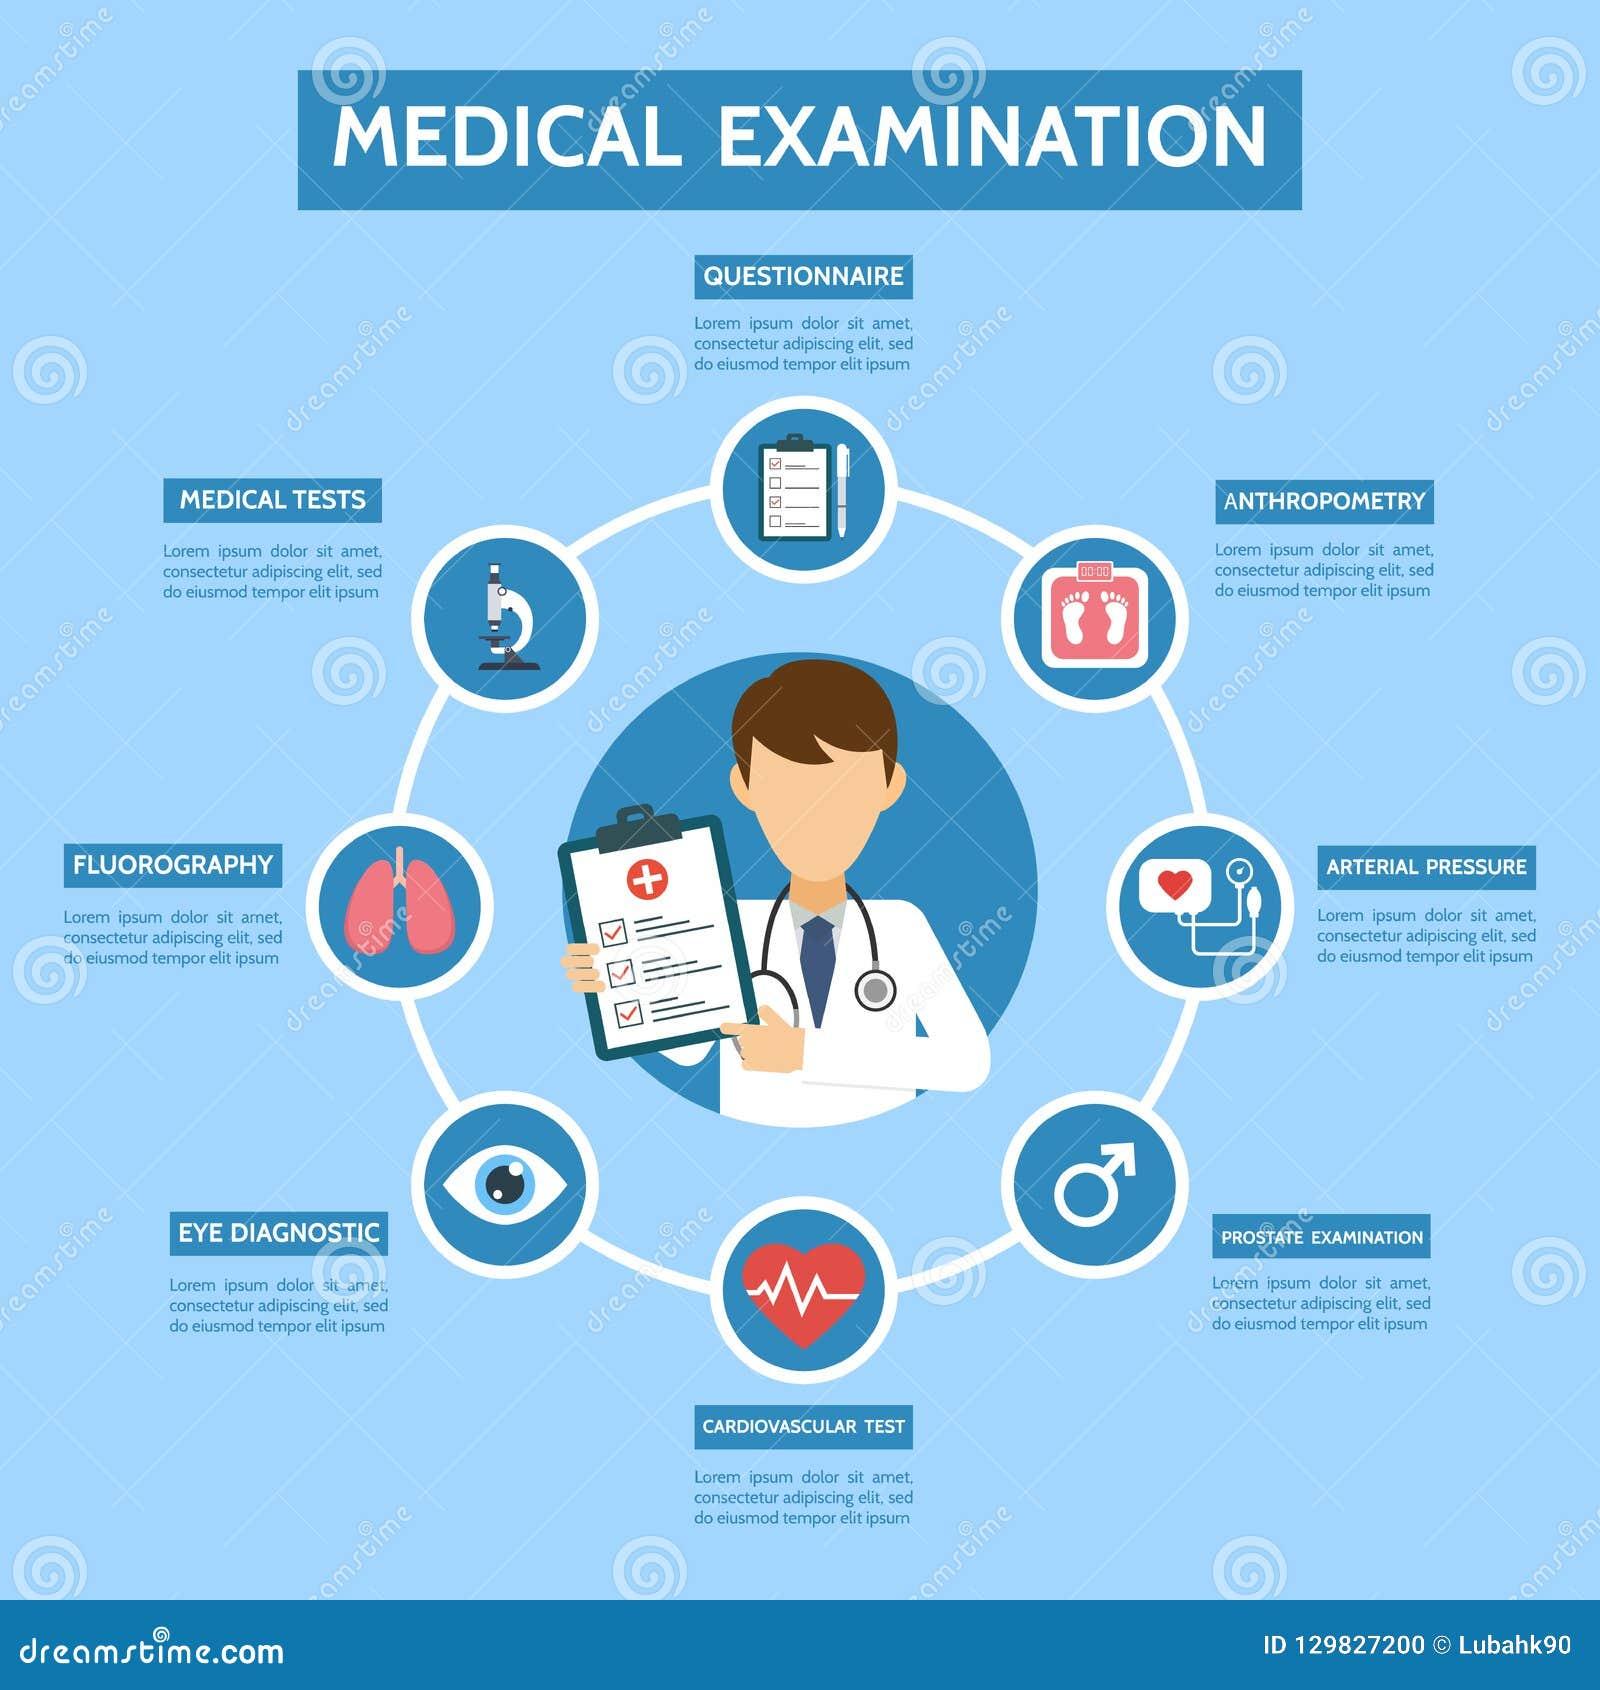 Medical Examination Infographic Concept  Medicine Healthcare